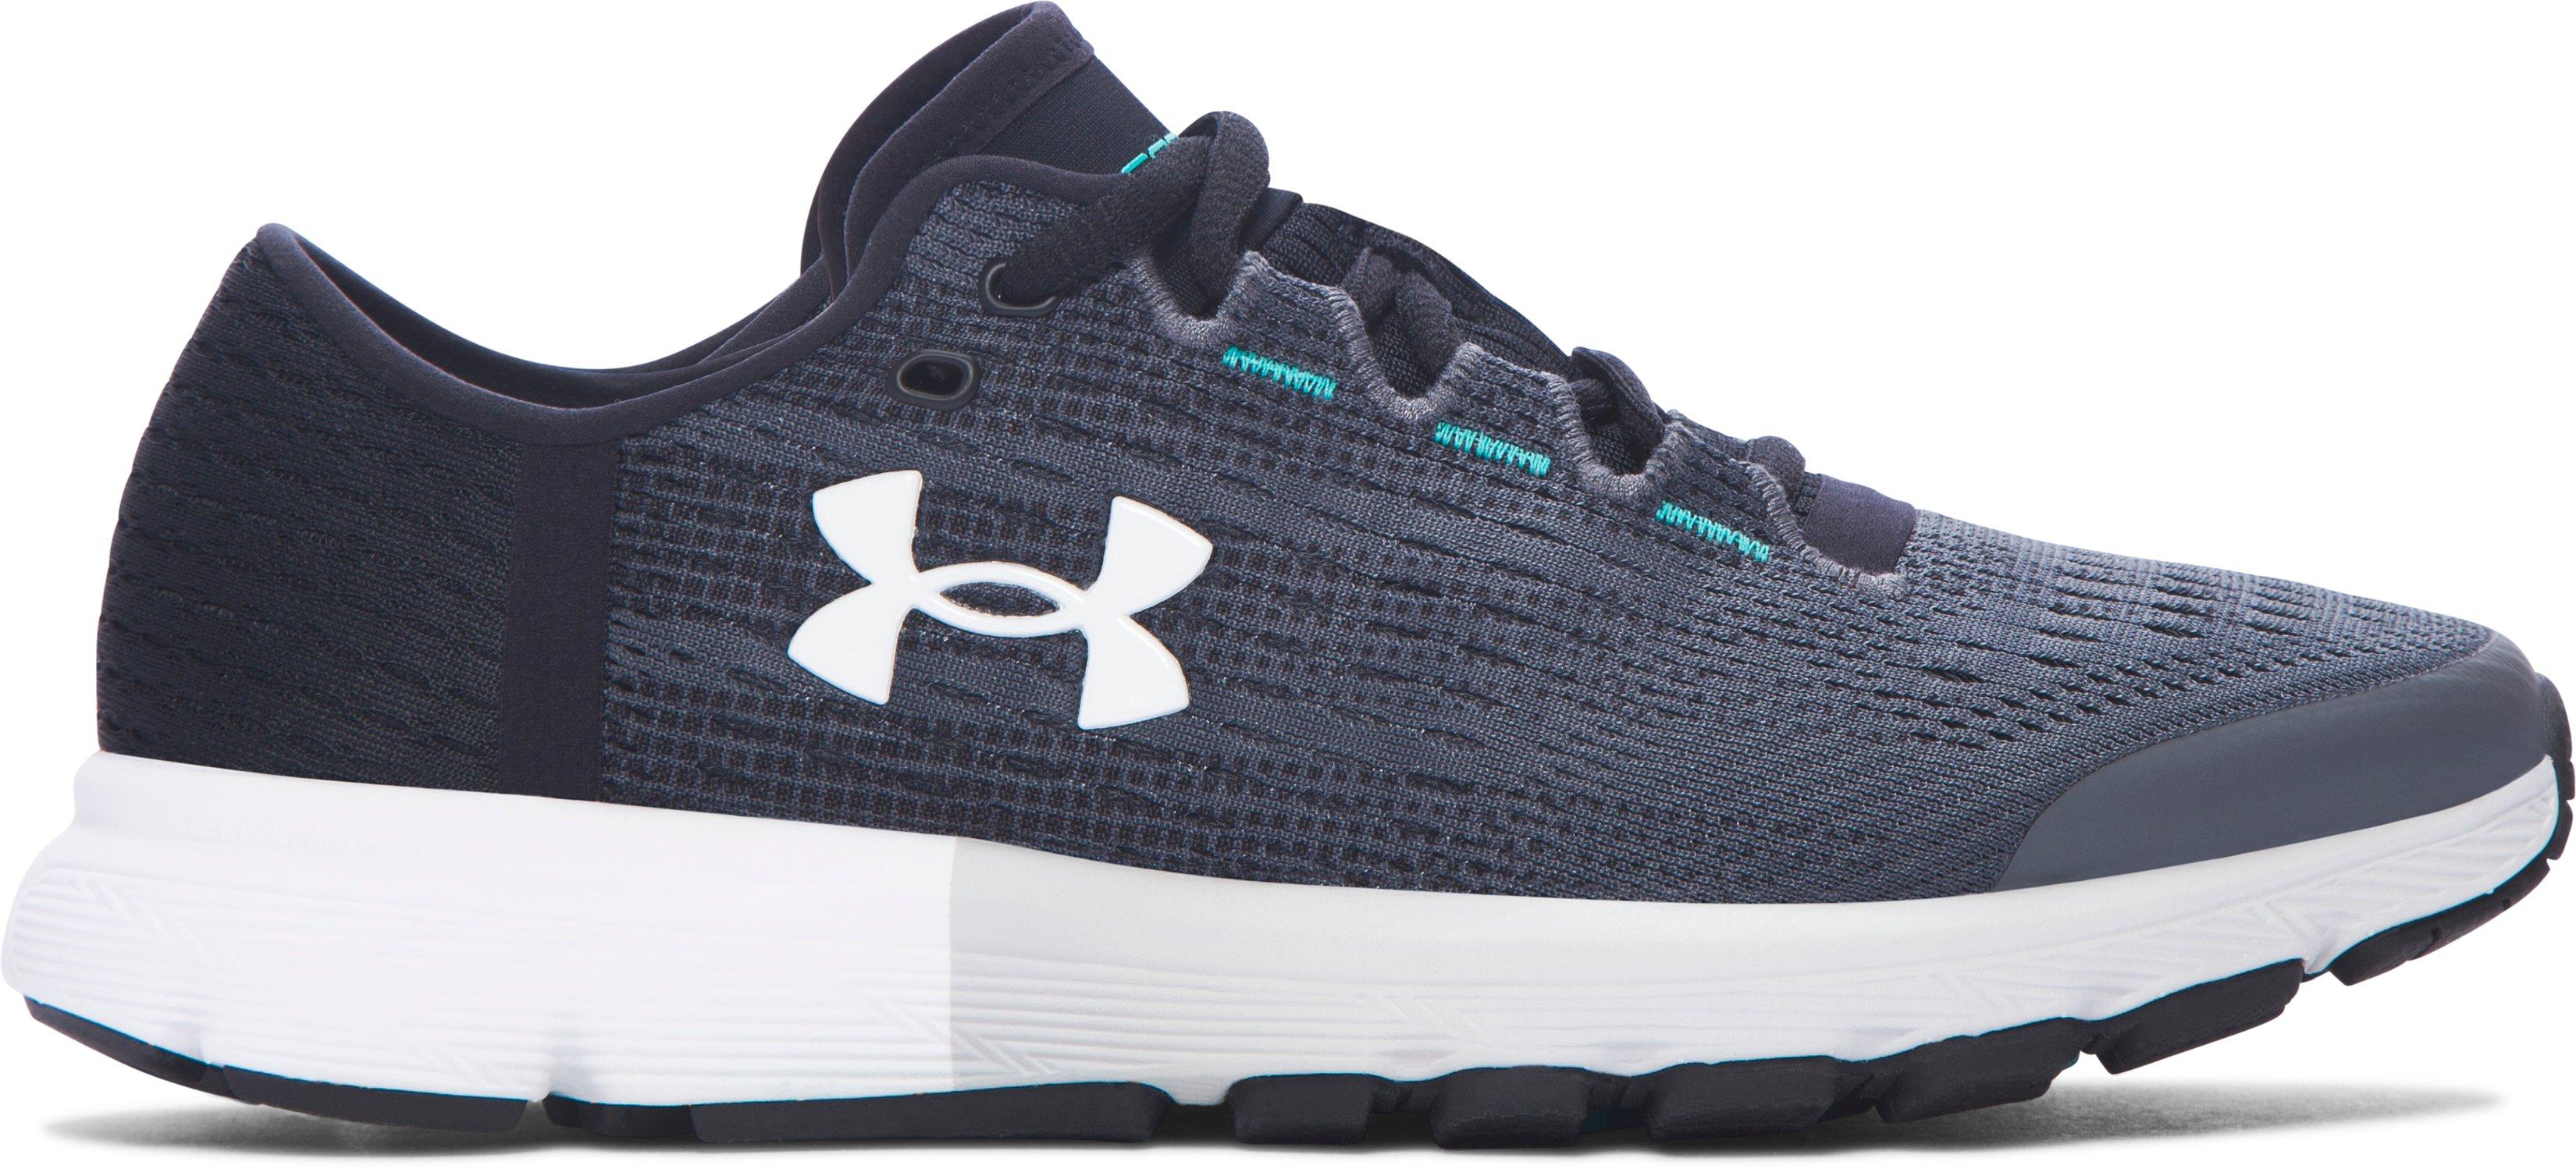 Zapatillas de Running UA SpeedForm® Velociti para Mujer, 360 degree view